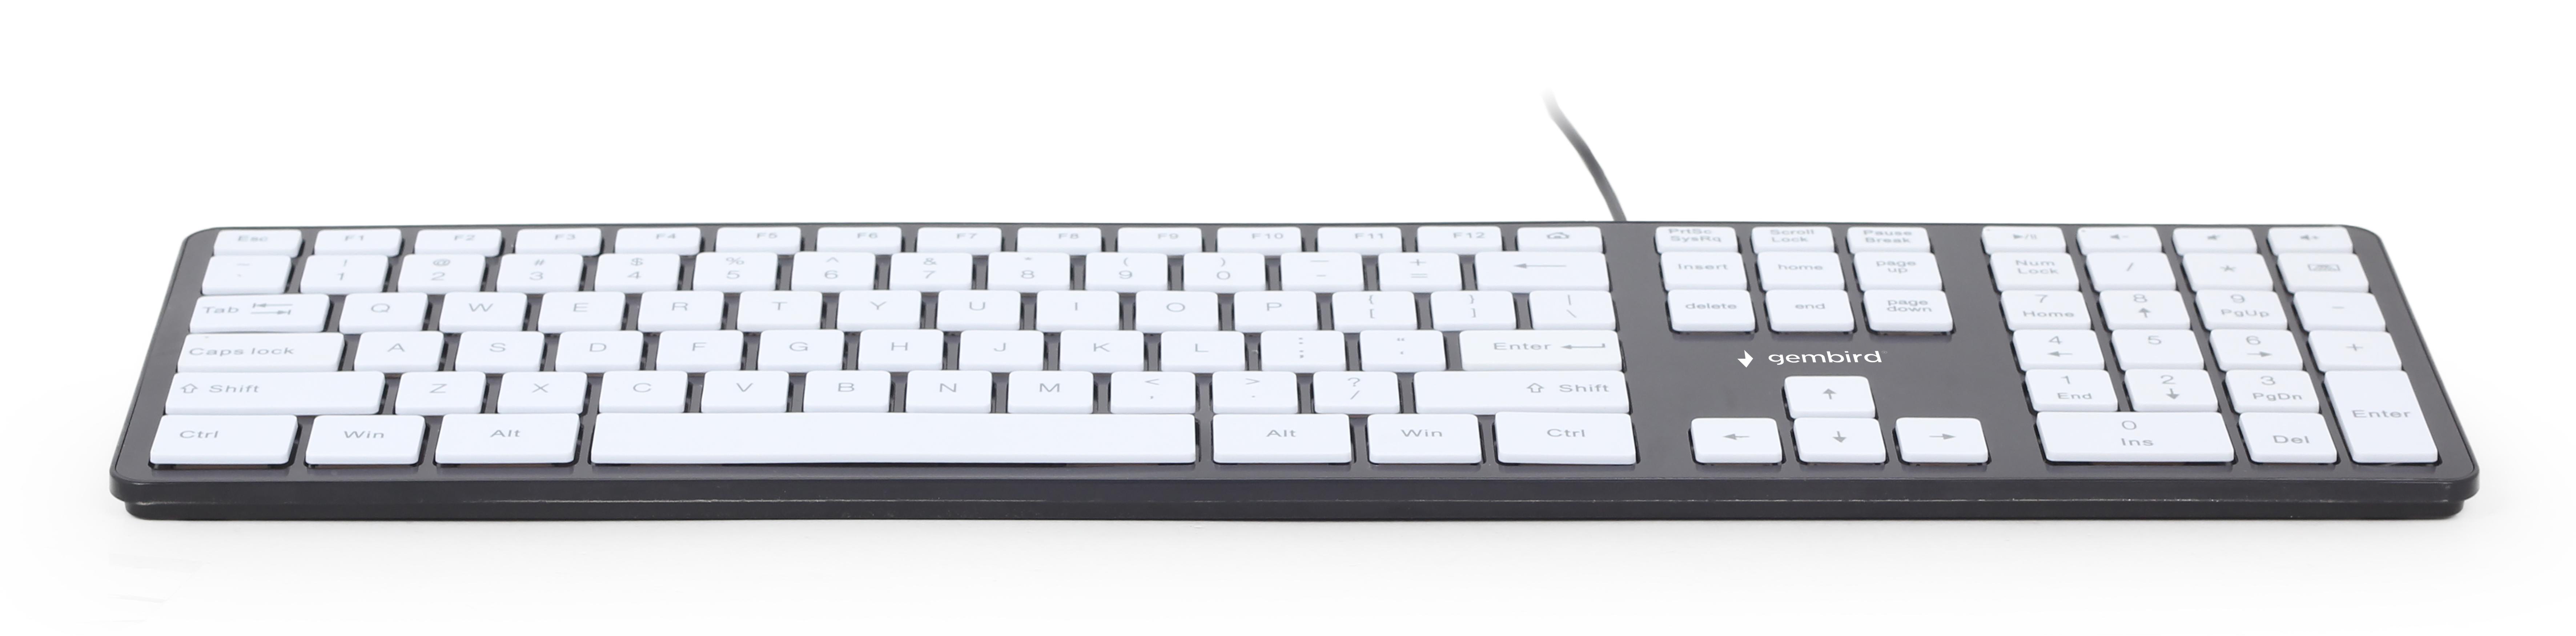 Chocolate Keyboard, US layout, black body, white keys (KB